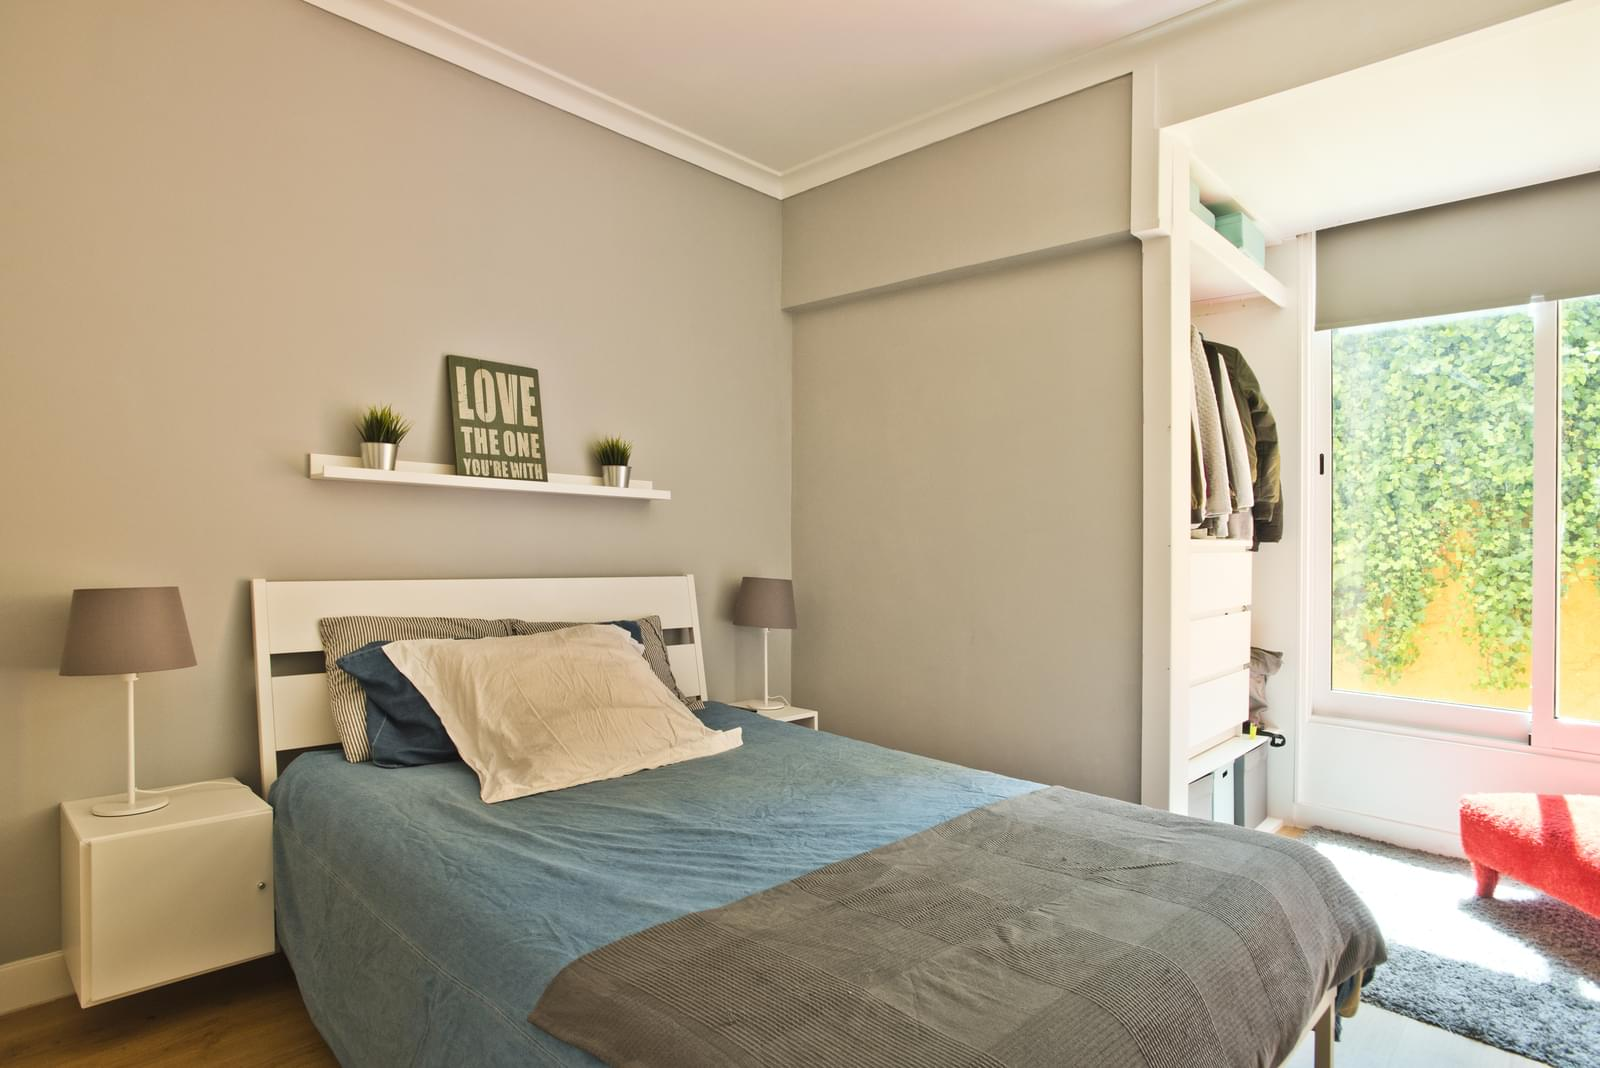 pf17010-apartamento-t4-cascais-f10f59db-28bd-42ee-b515-9a6cf654113c